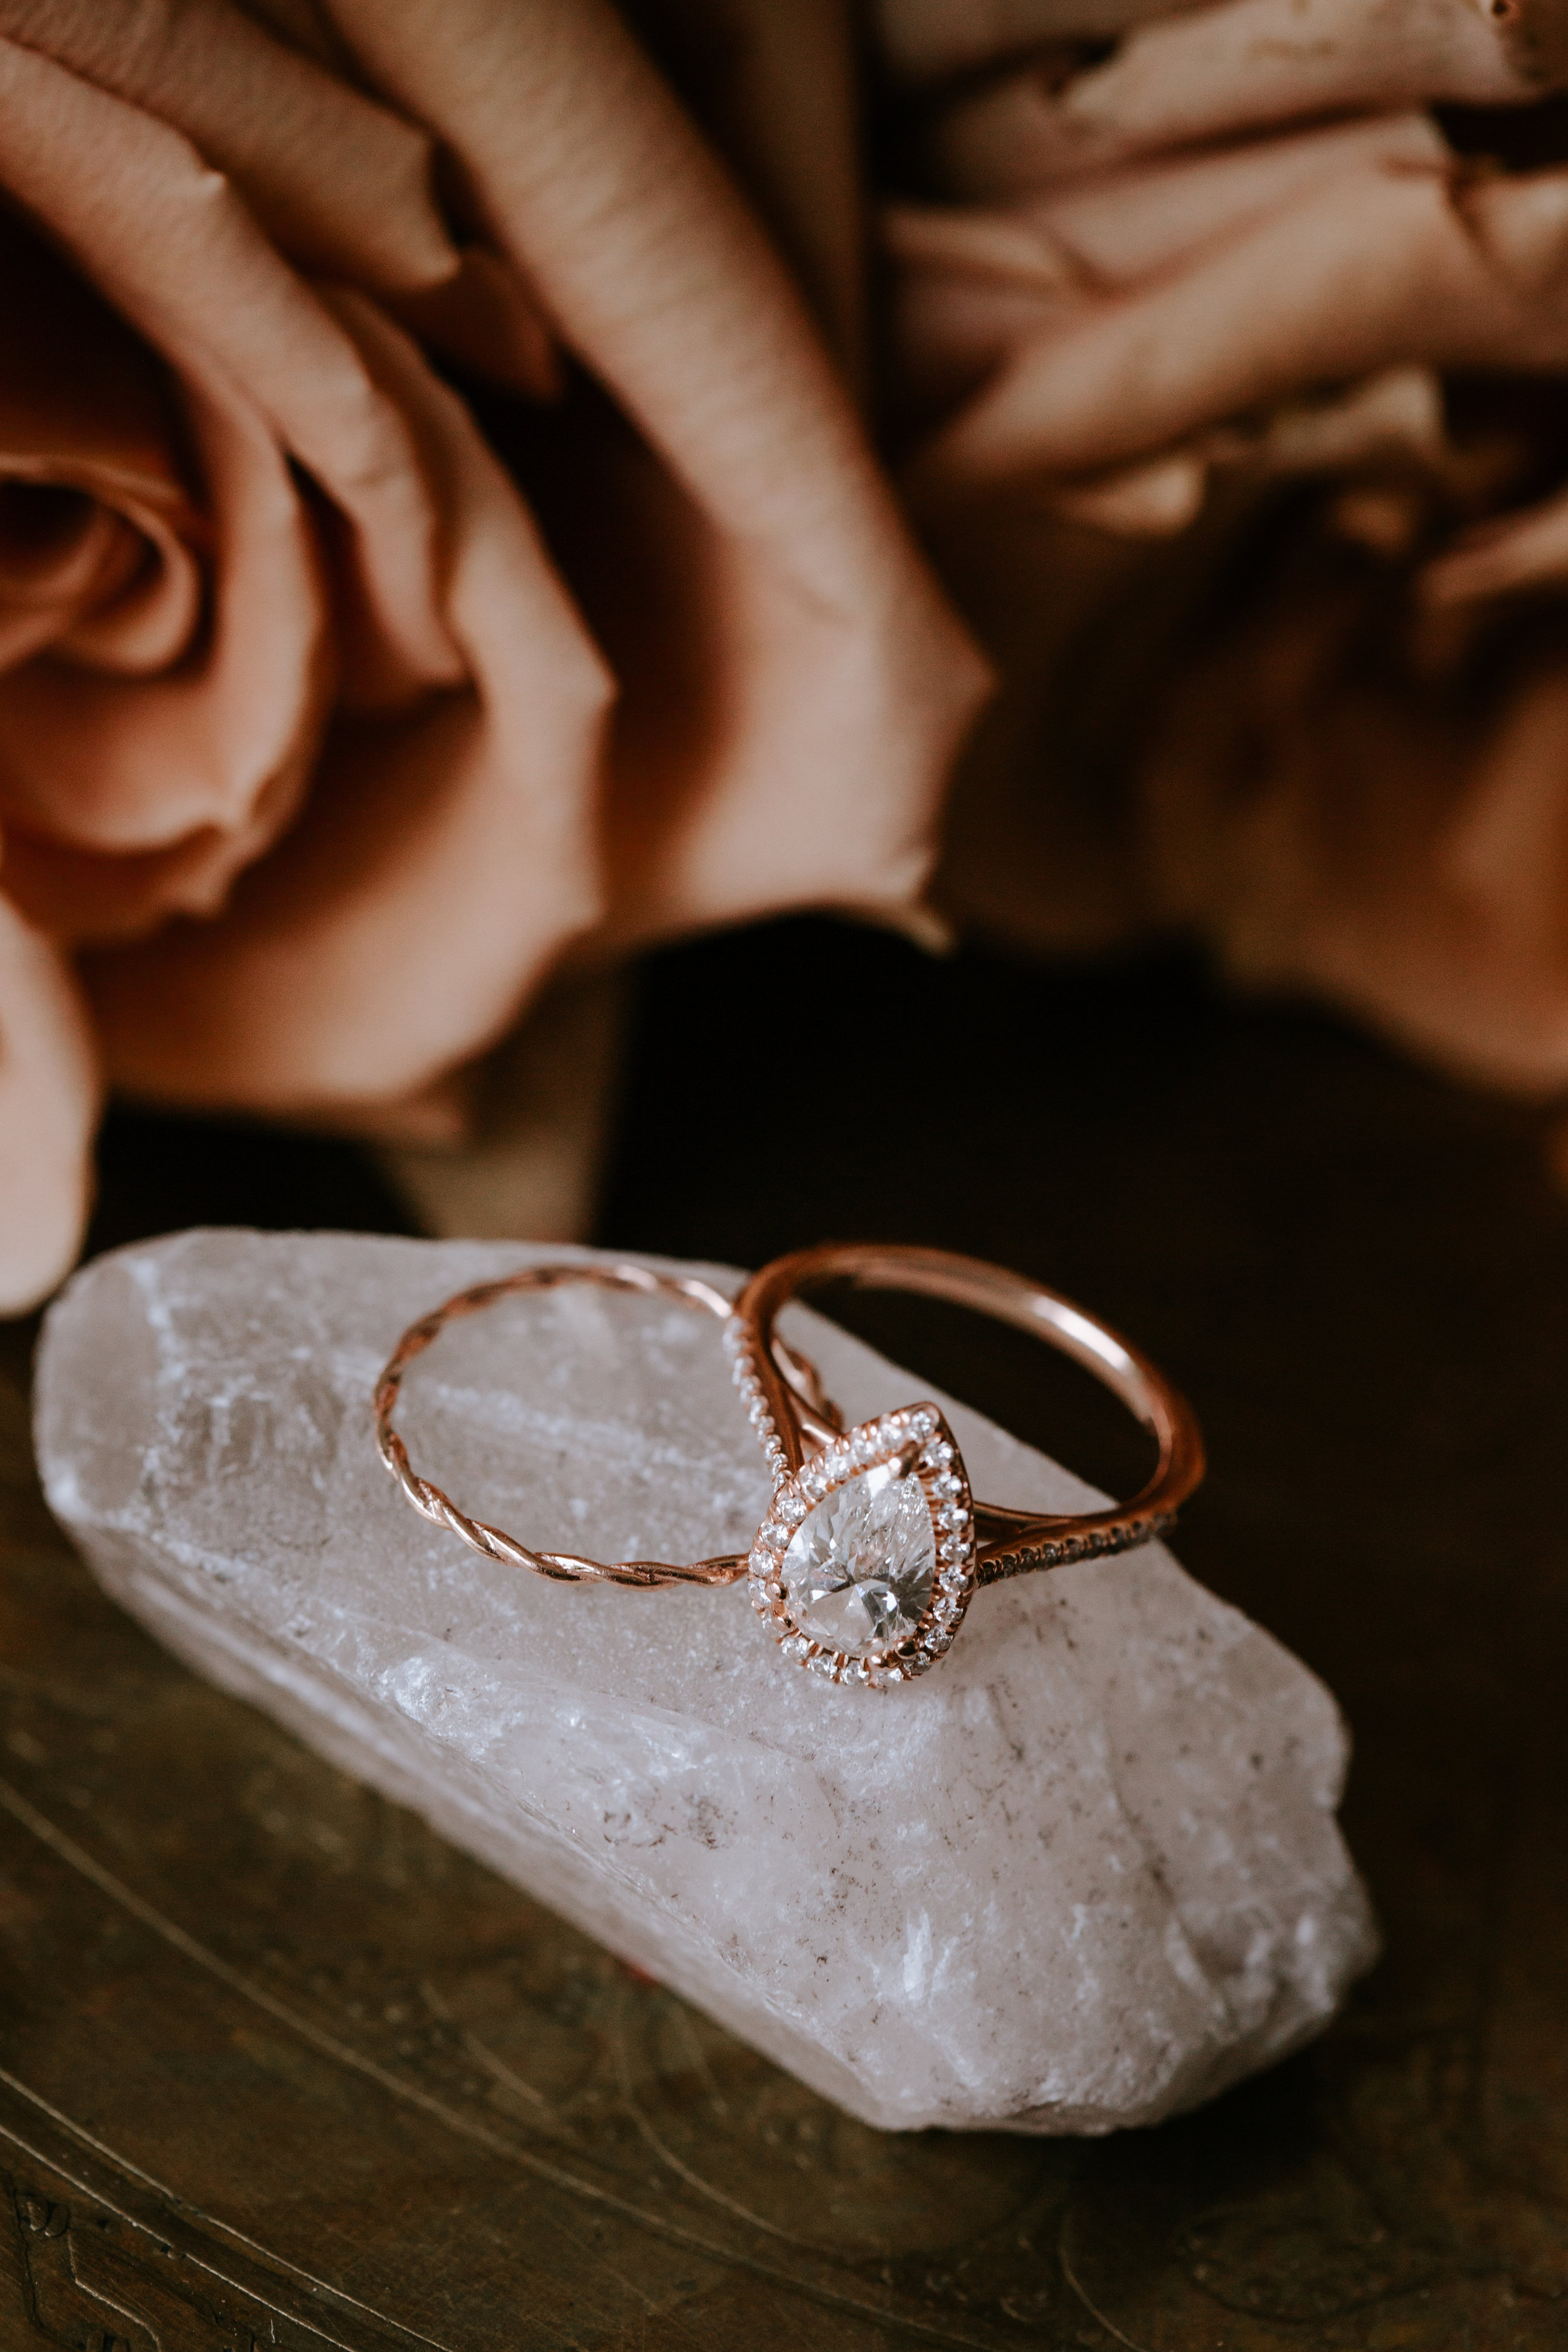 2019-05-26_Callie-Evan_Wedding_Joshua Tree_Paige Nelson_PREVIEWS HR-10.jpg